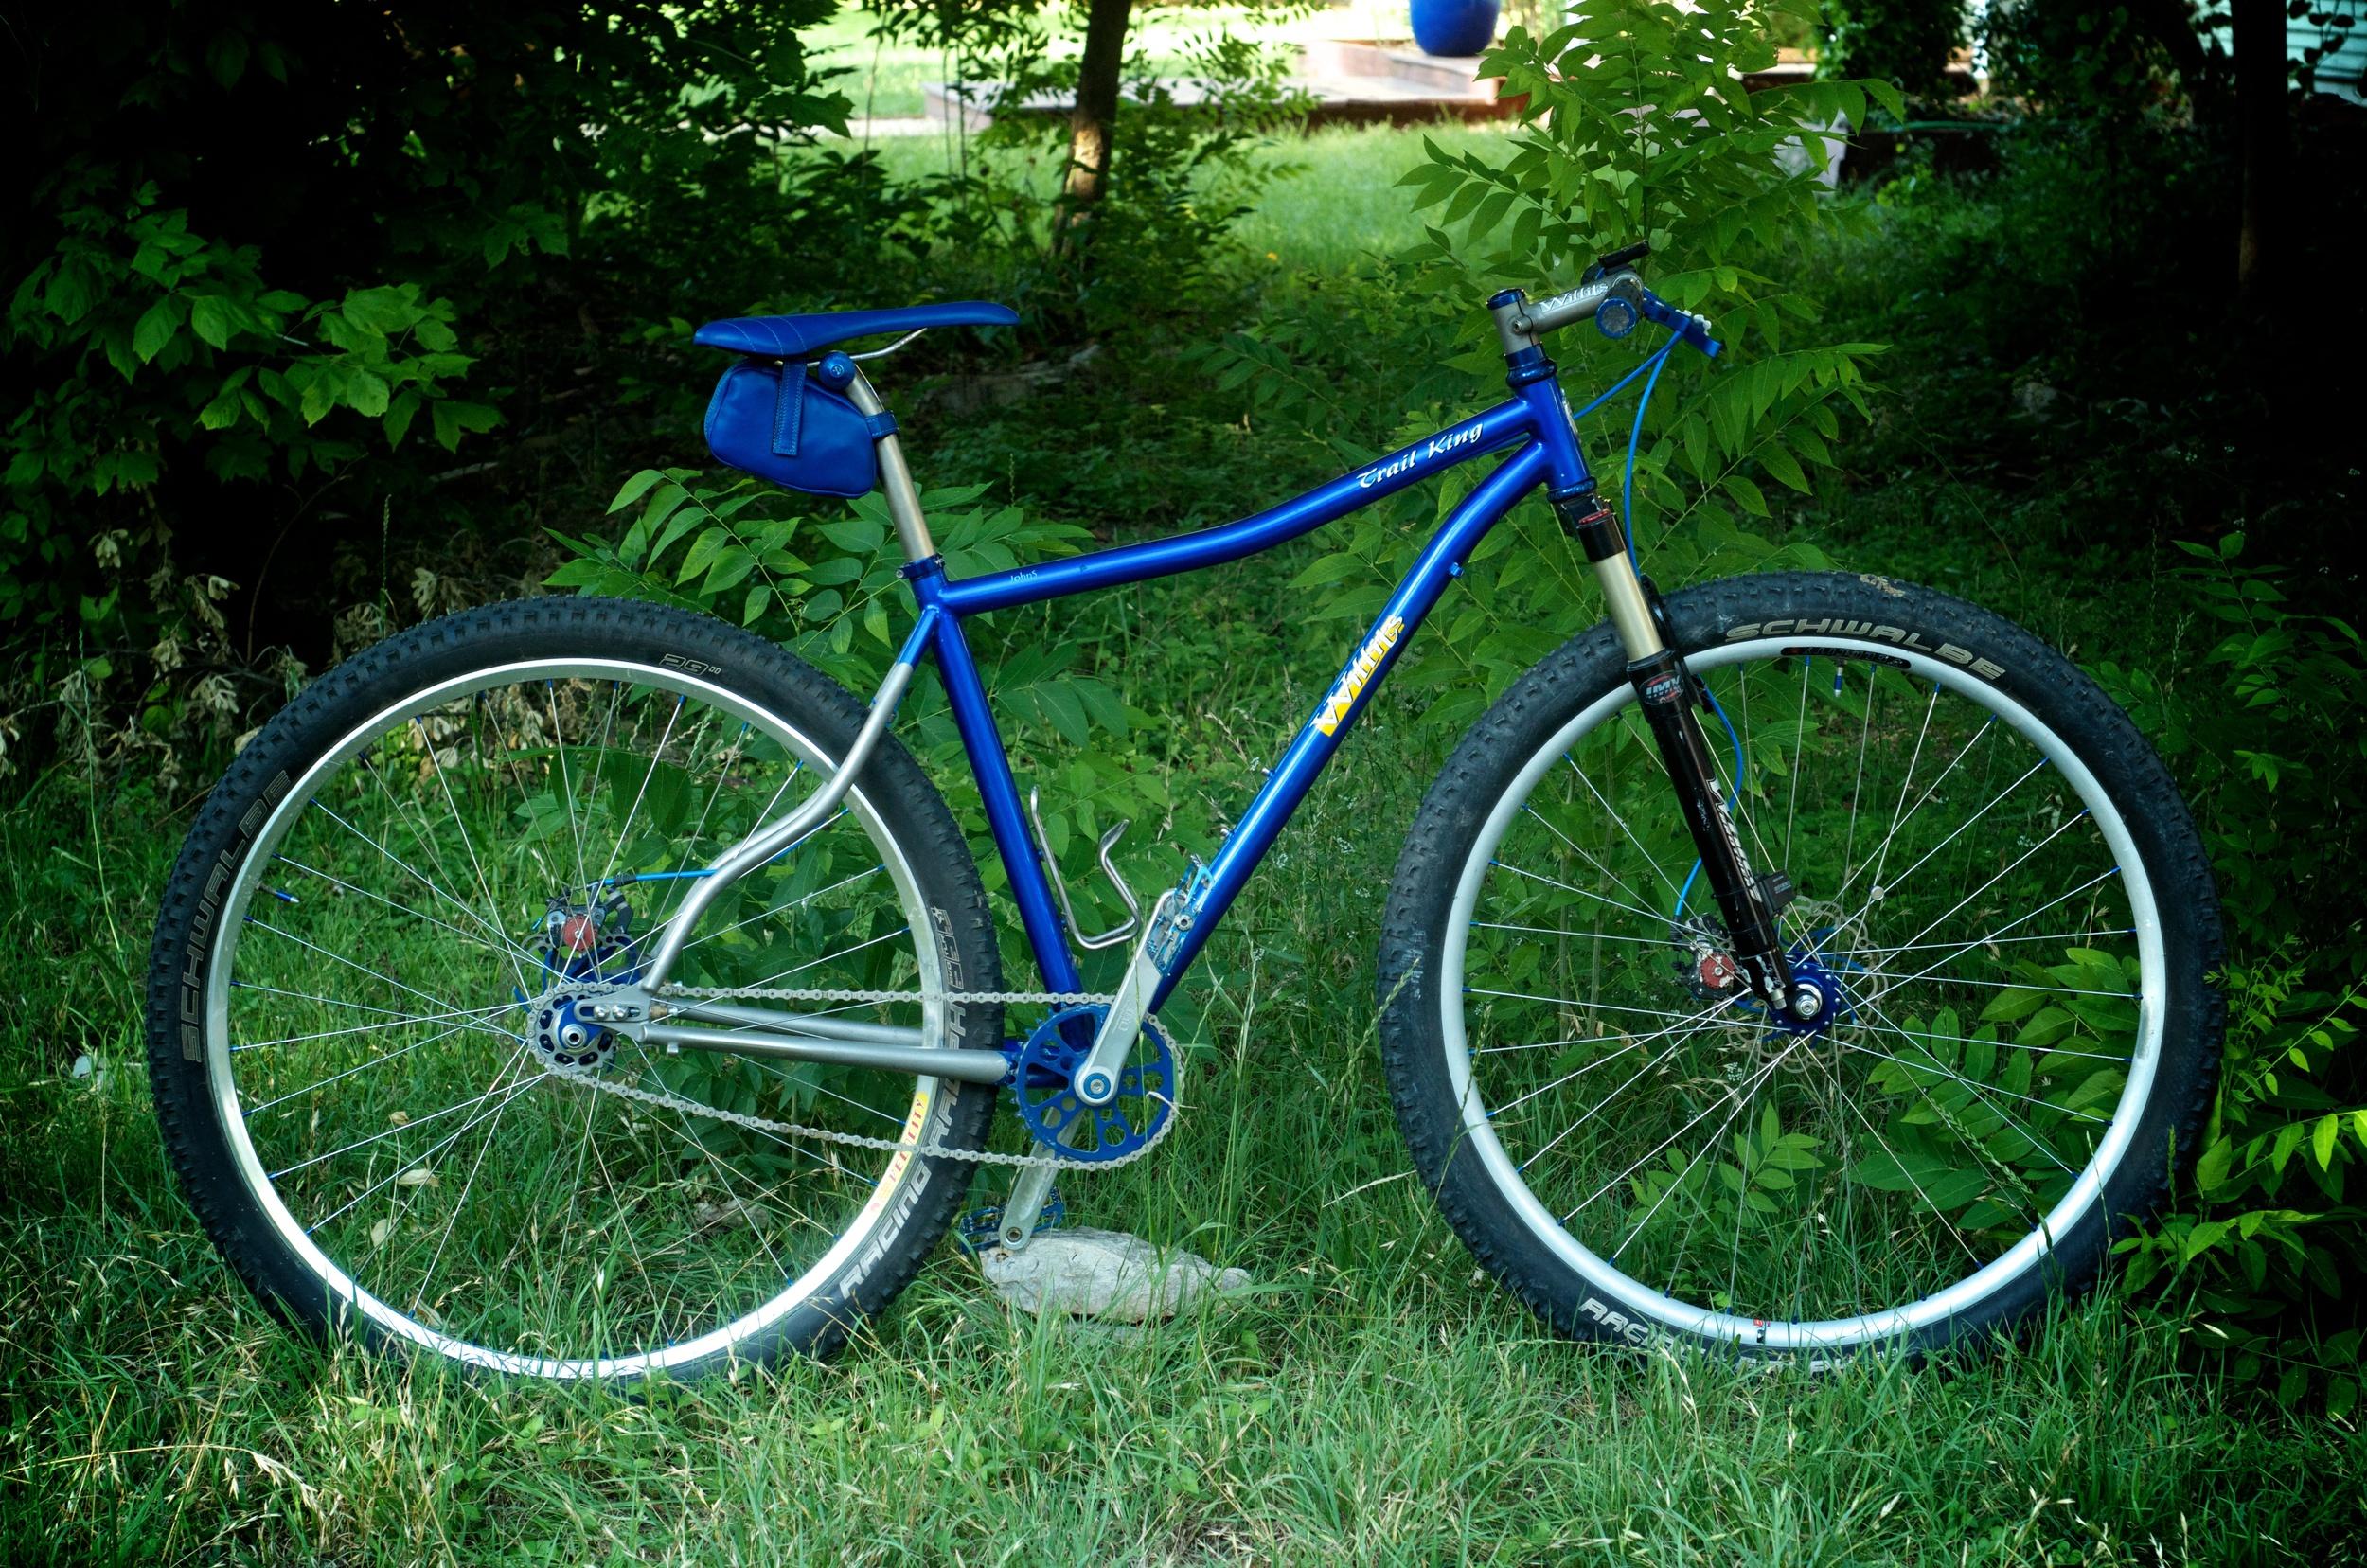 Custom-blue-leather-Selle_Italia-SLK-recover-repair-saddle-bag-handmade-Austin-texas-Willits-eriksen-vintage-brooks-busyman-grey-seat-vintage 1.jpg